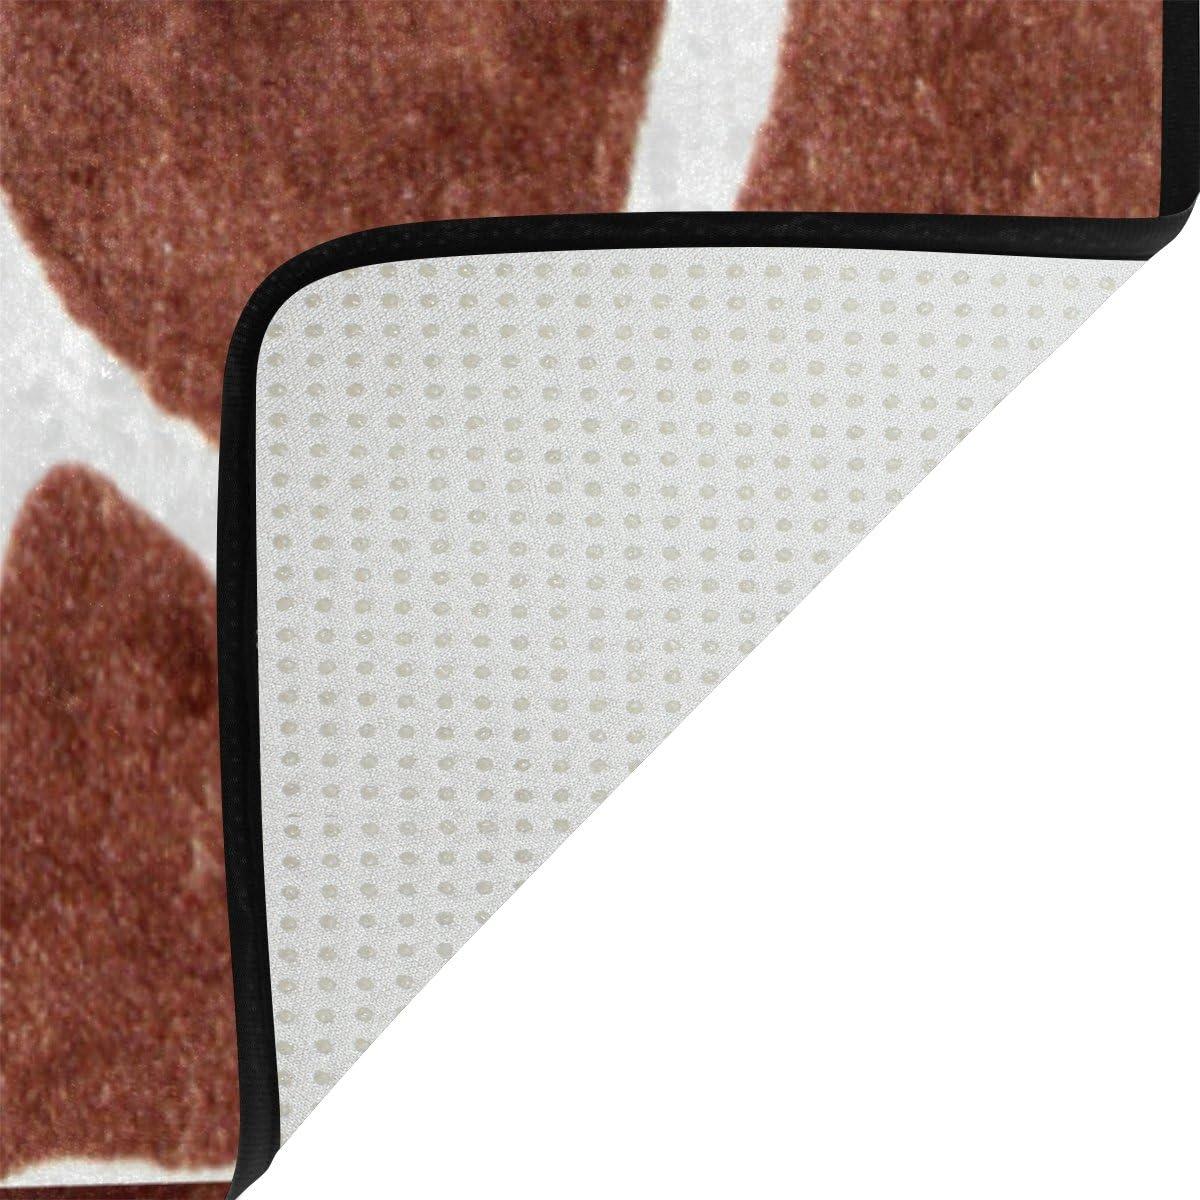 WOZO Animal Print Giraffe Spot Area Rug Rugs Non-Slip Floor Mat Doormats Living Dining Room Bedroom Dorm 31 x 20 inches Home Decor